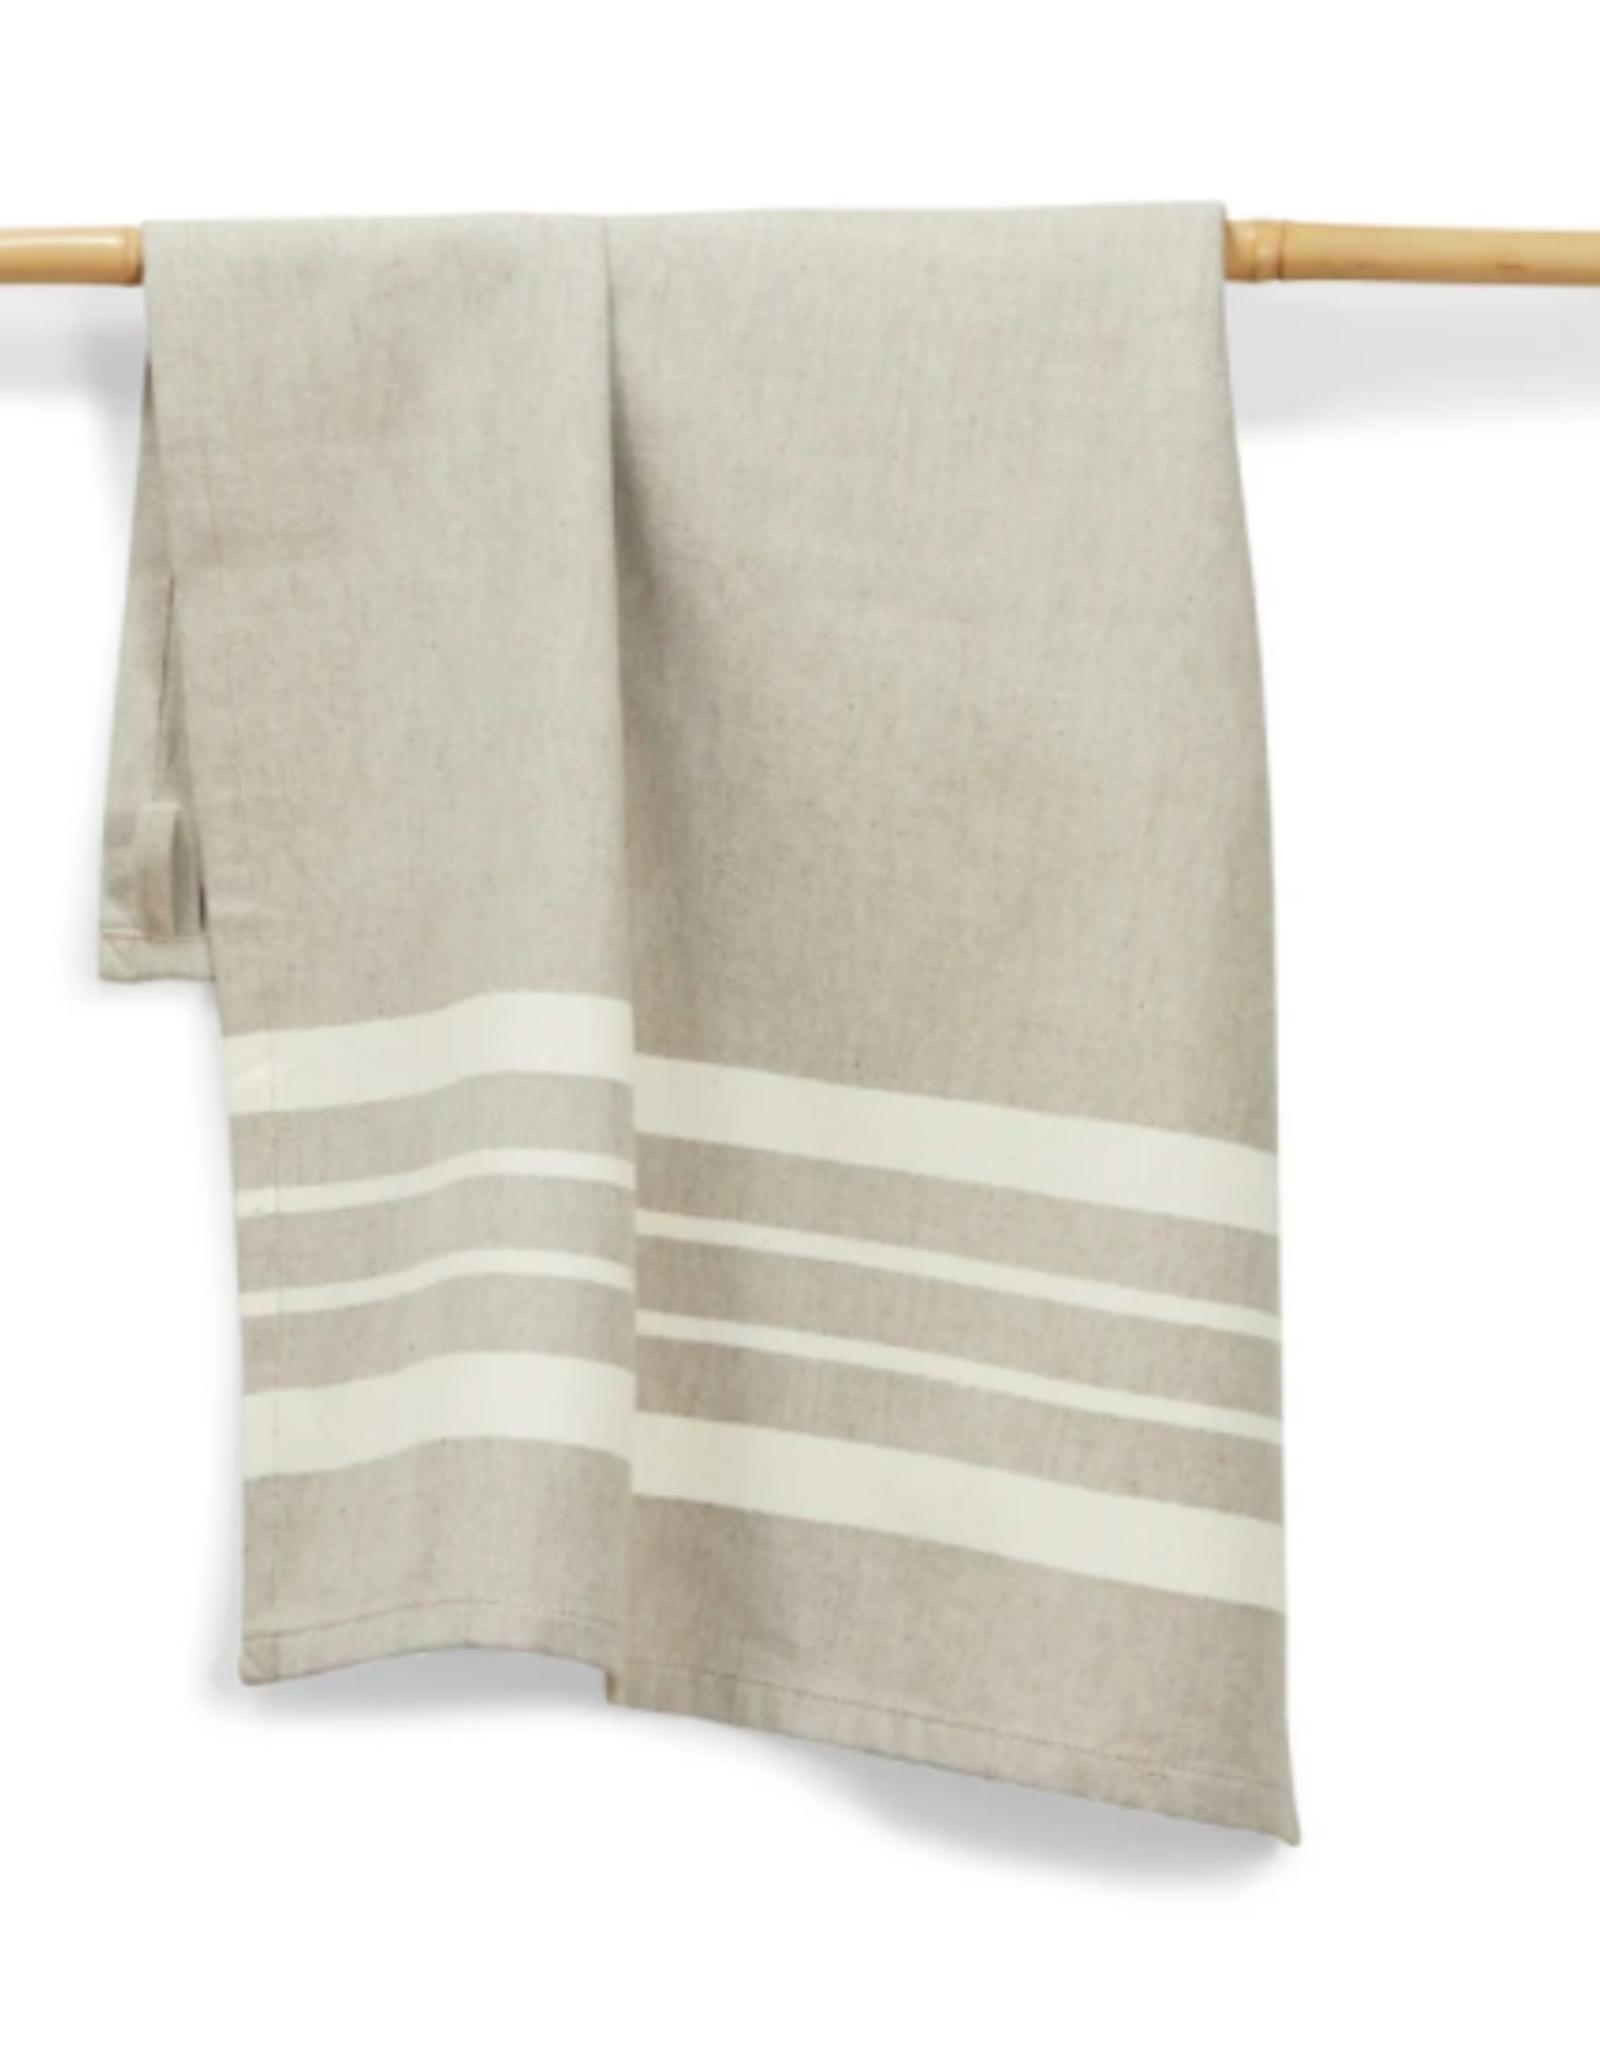 India, 27 x 19 Cotton Handwoven Kitchen Towels Chai